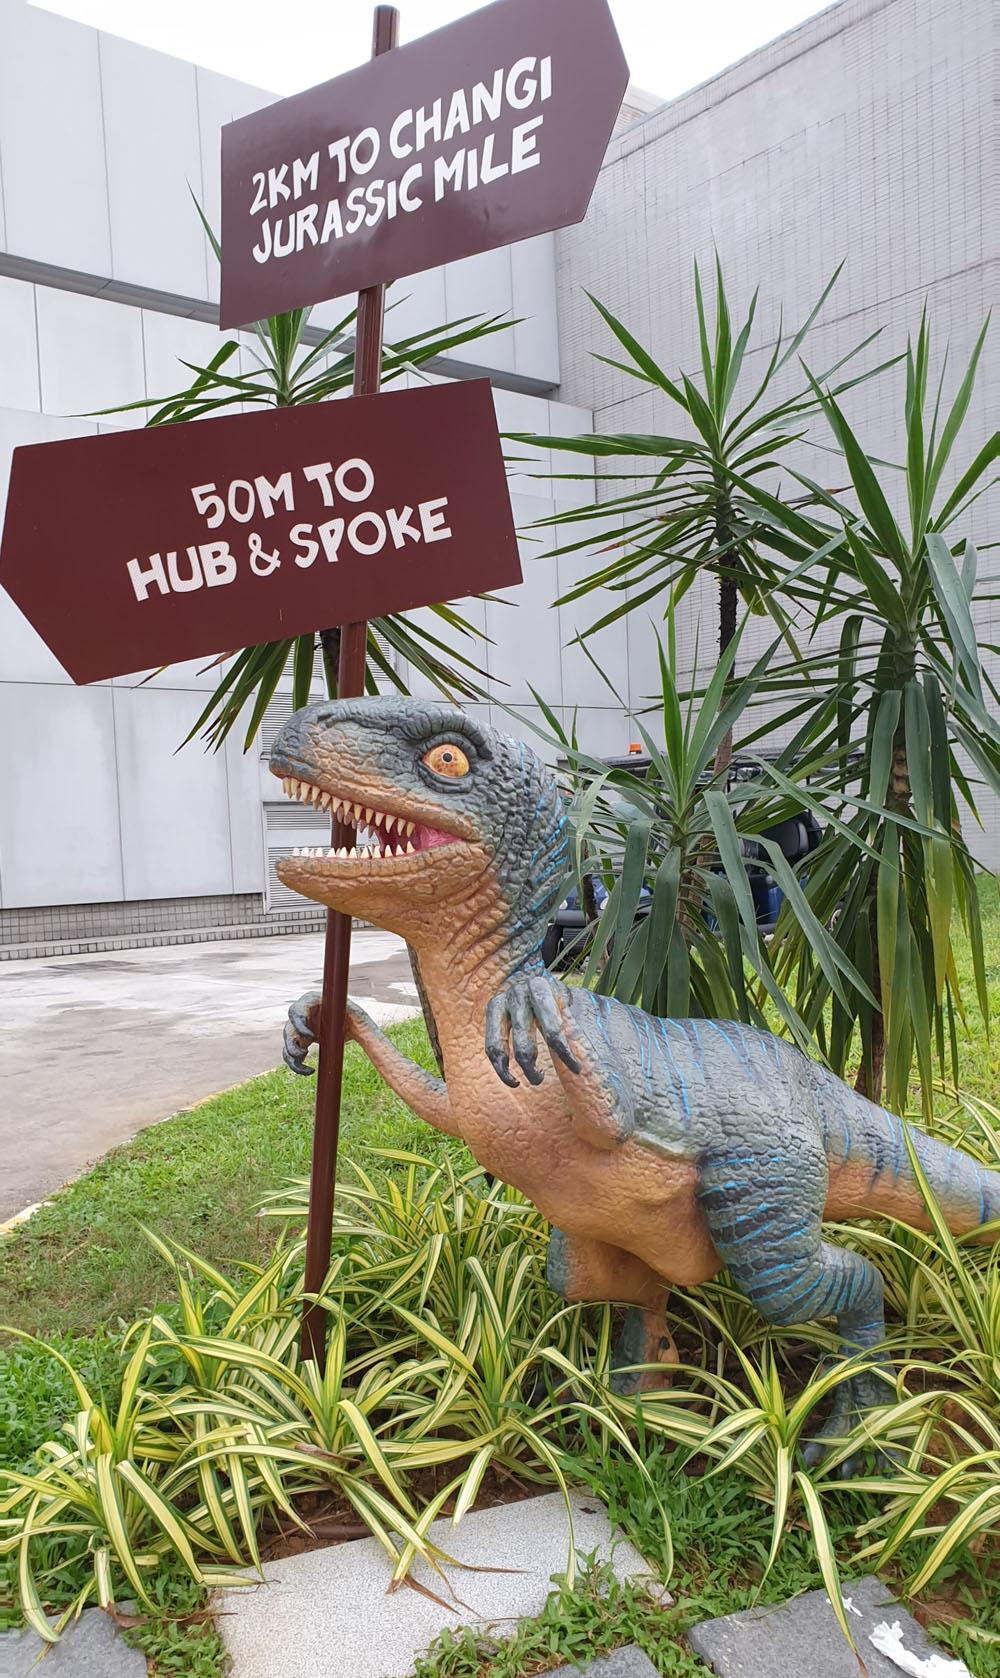 Hub & Spoke to Jurassic Mile